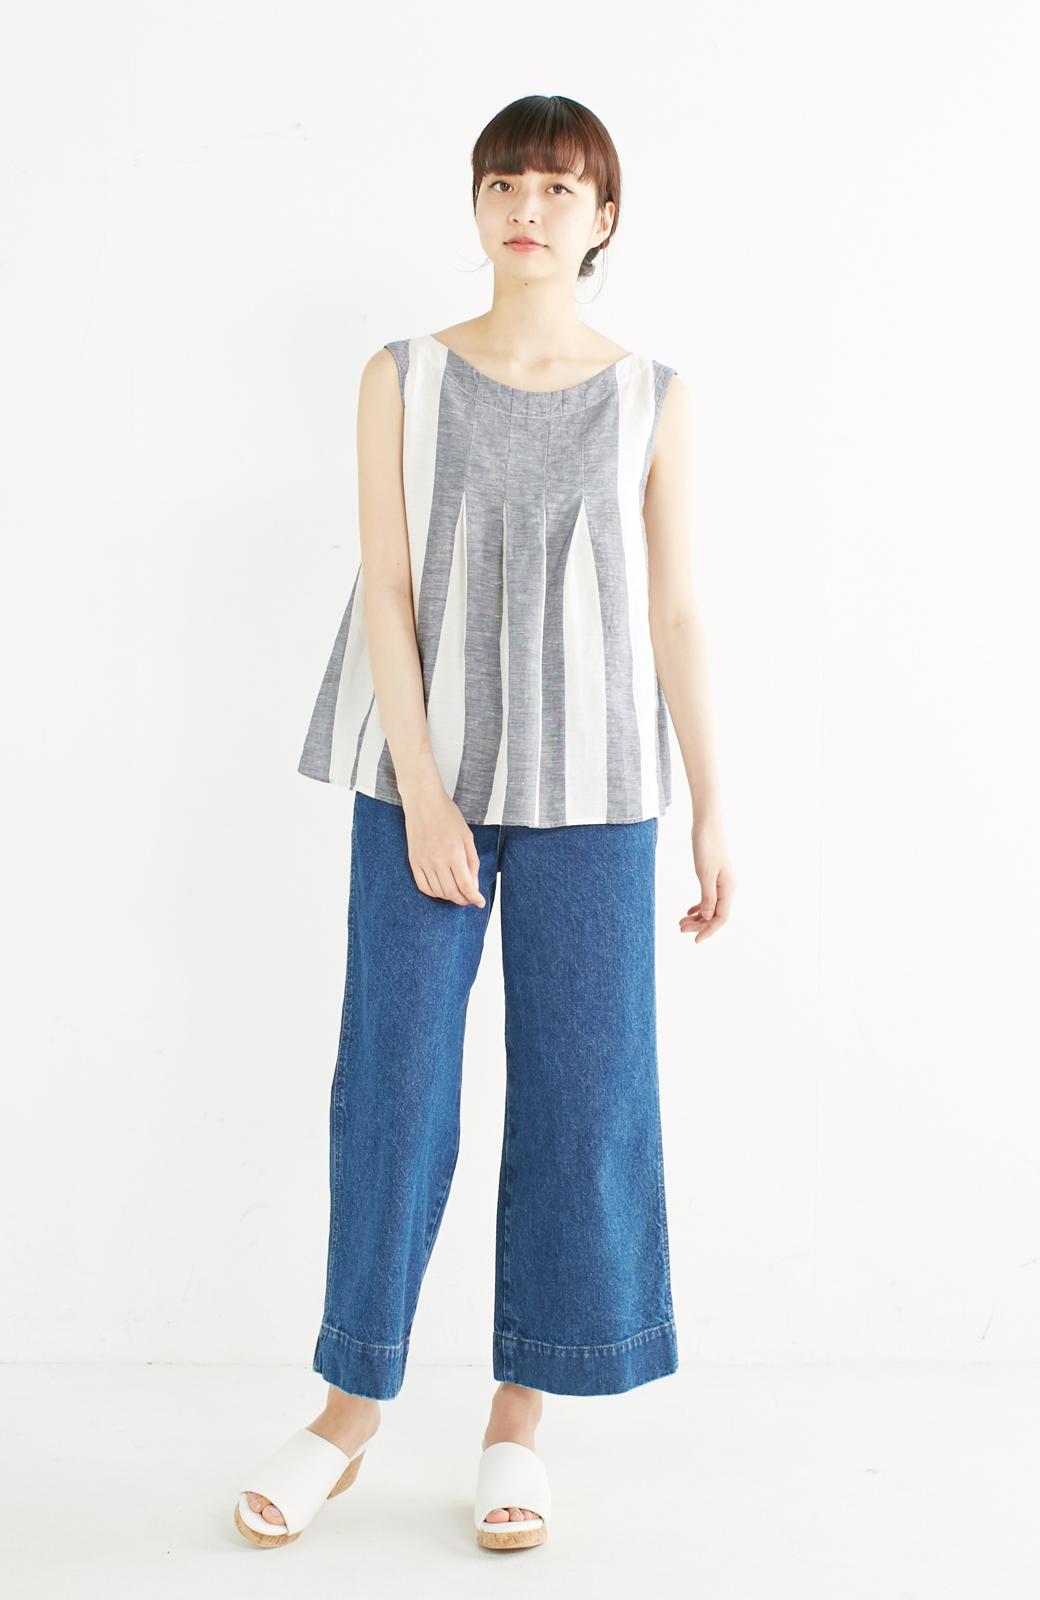 haco! てとひとて miho umezawa ストライプツーピースドレス <ホワイト×ブルー>の商品写真4